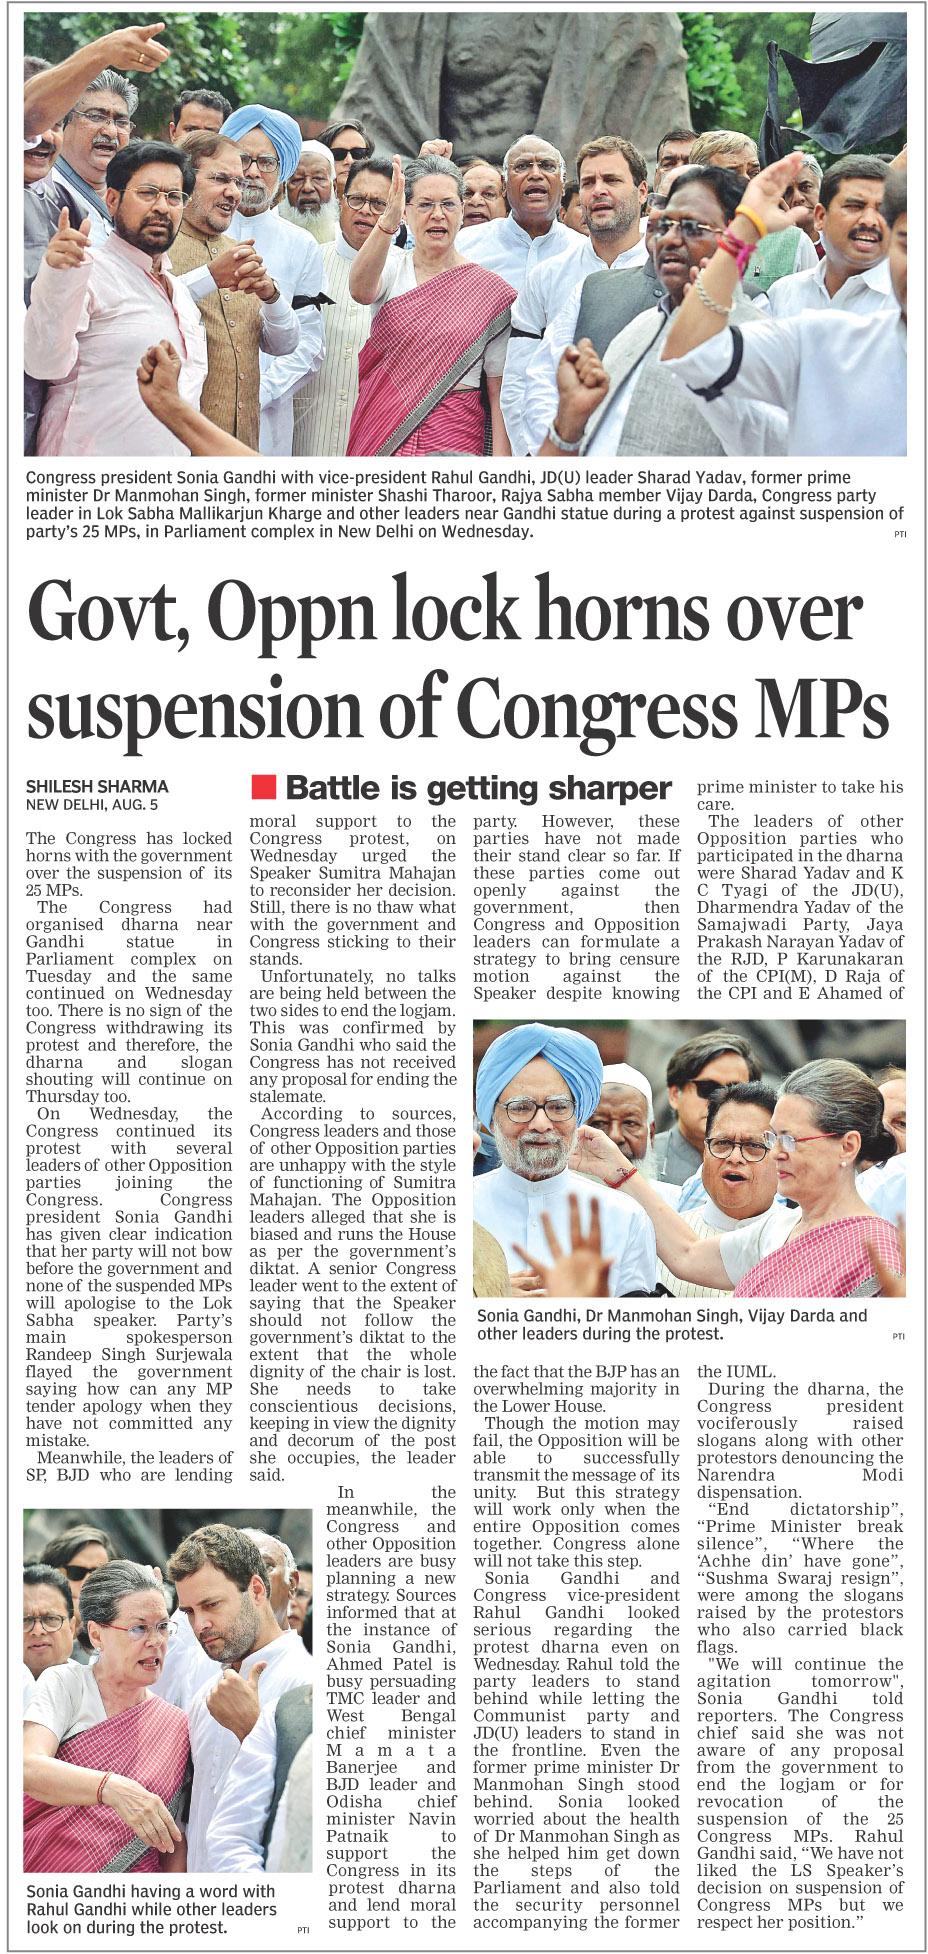 Govt, Oppn lock horns over suspension of Congress MPs